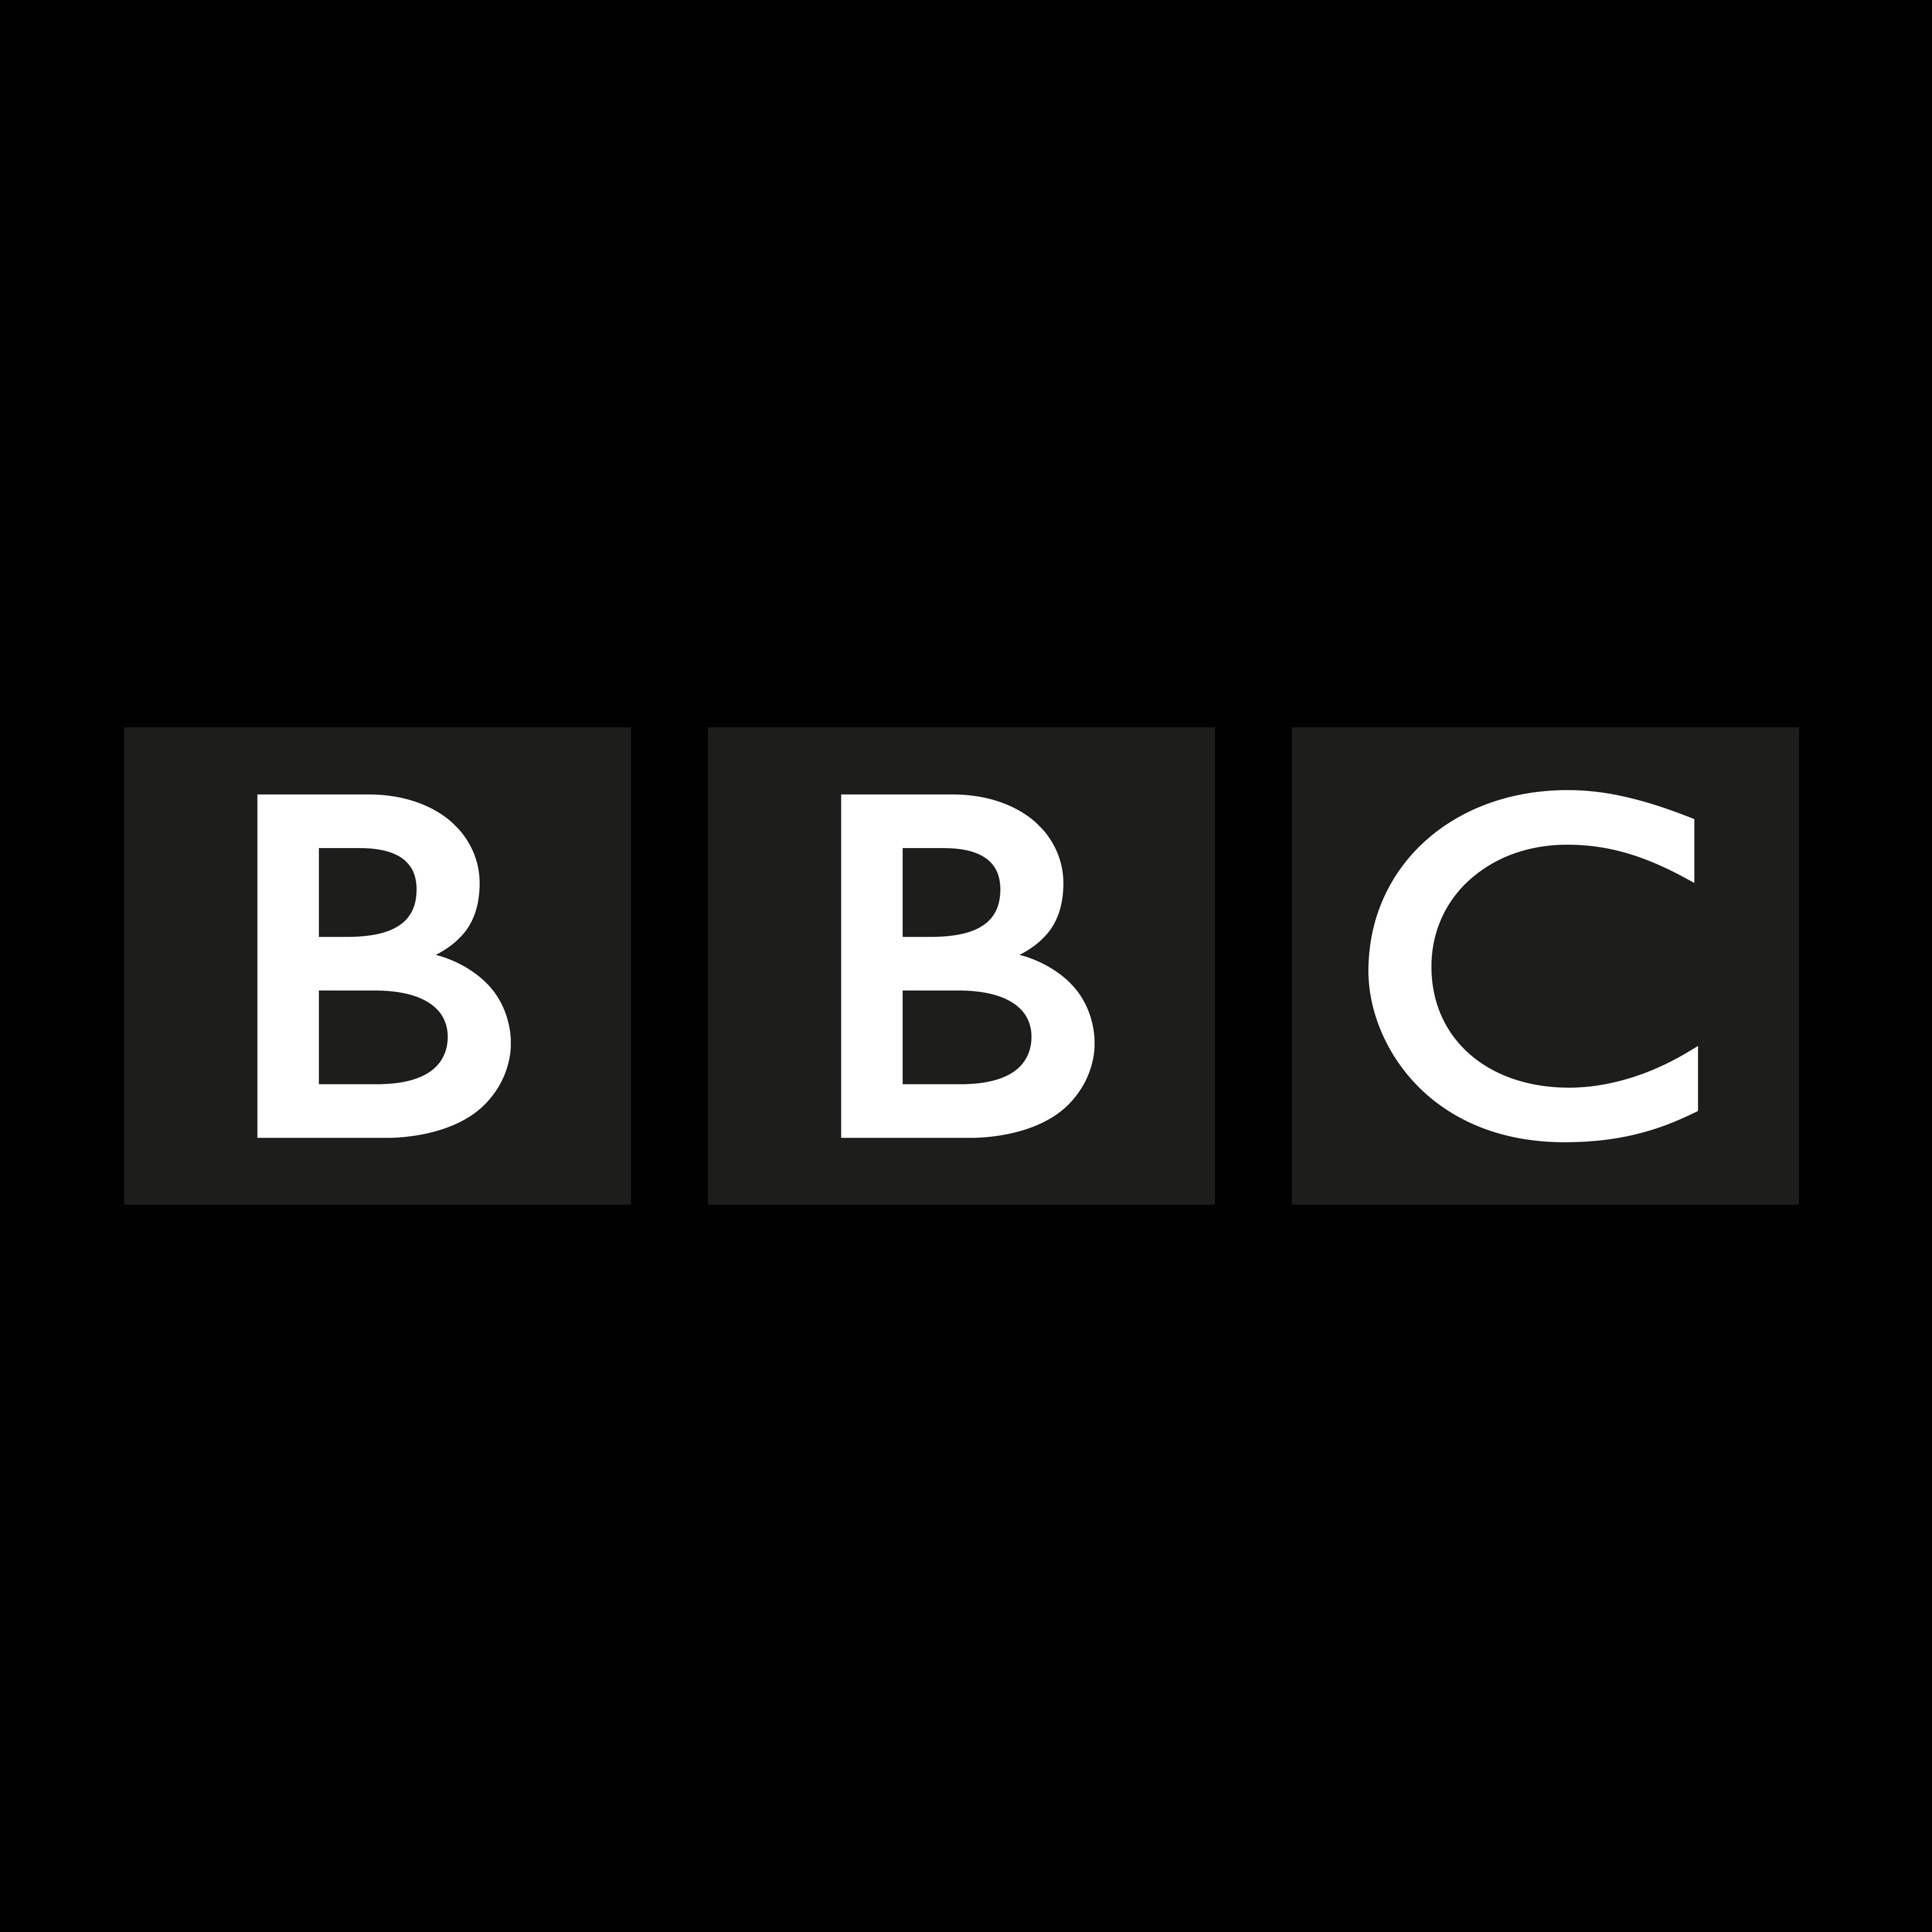 Bbc Logo - Png And Vector - Logo Download - Bbc Logo PNG